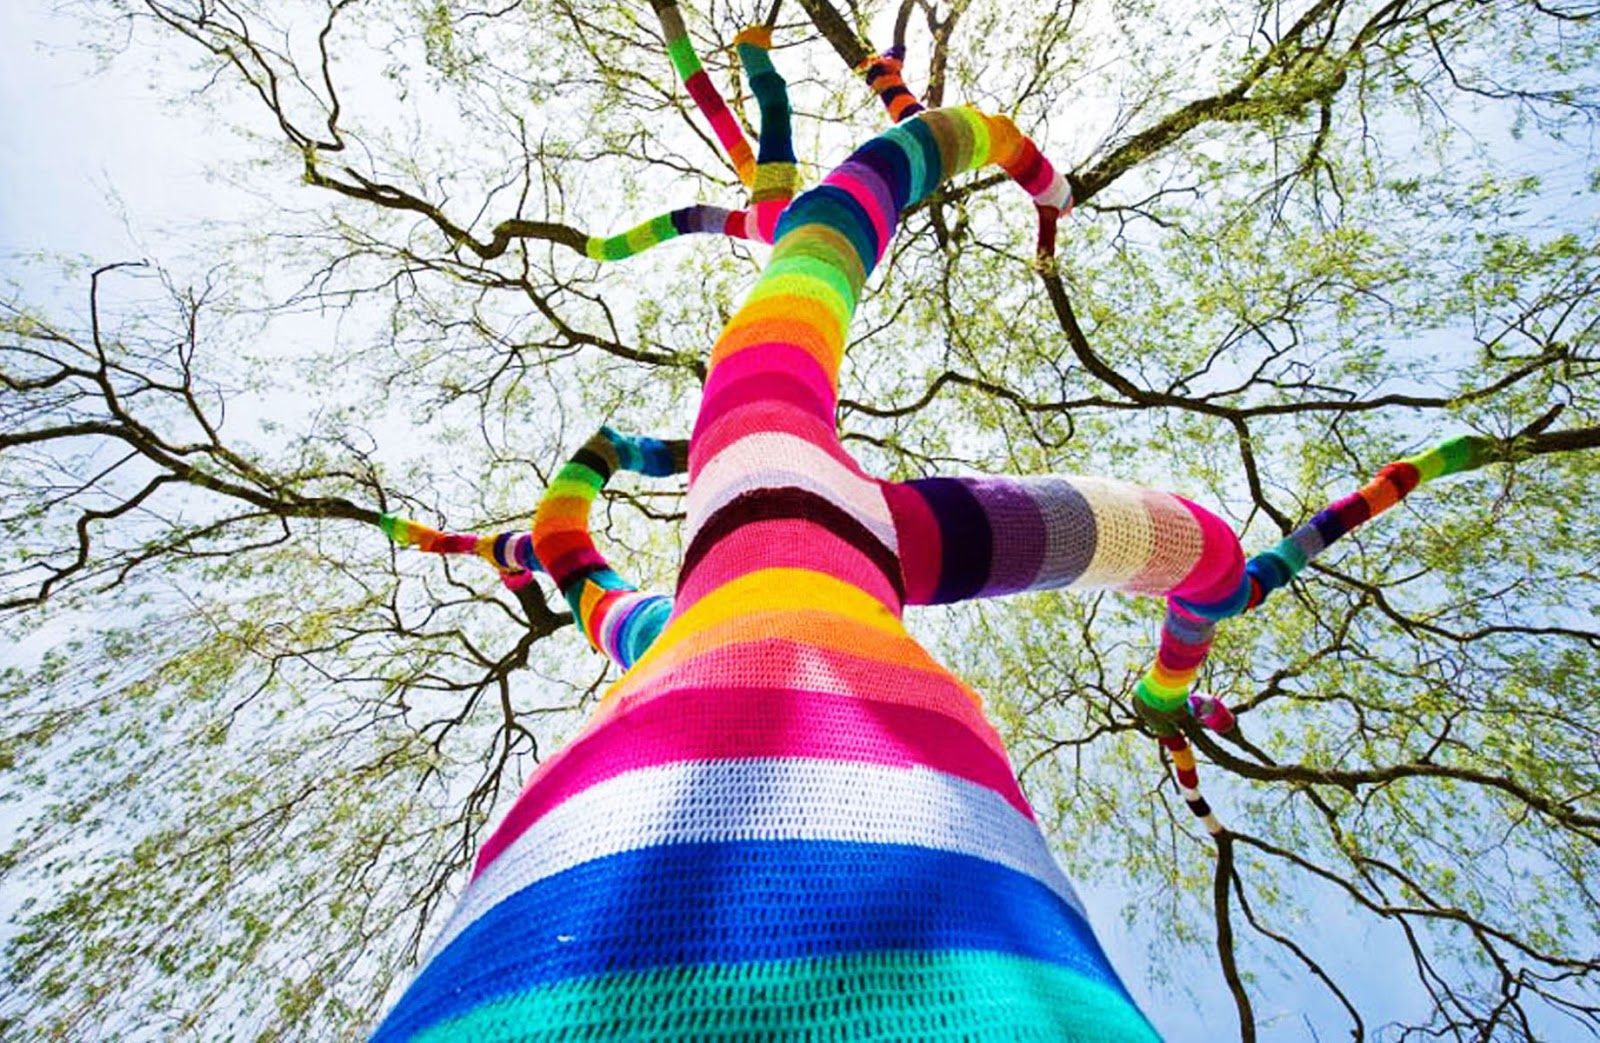 yarn-bombing-knit-graffiti-street-art